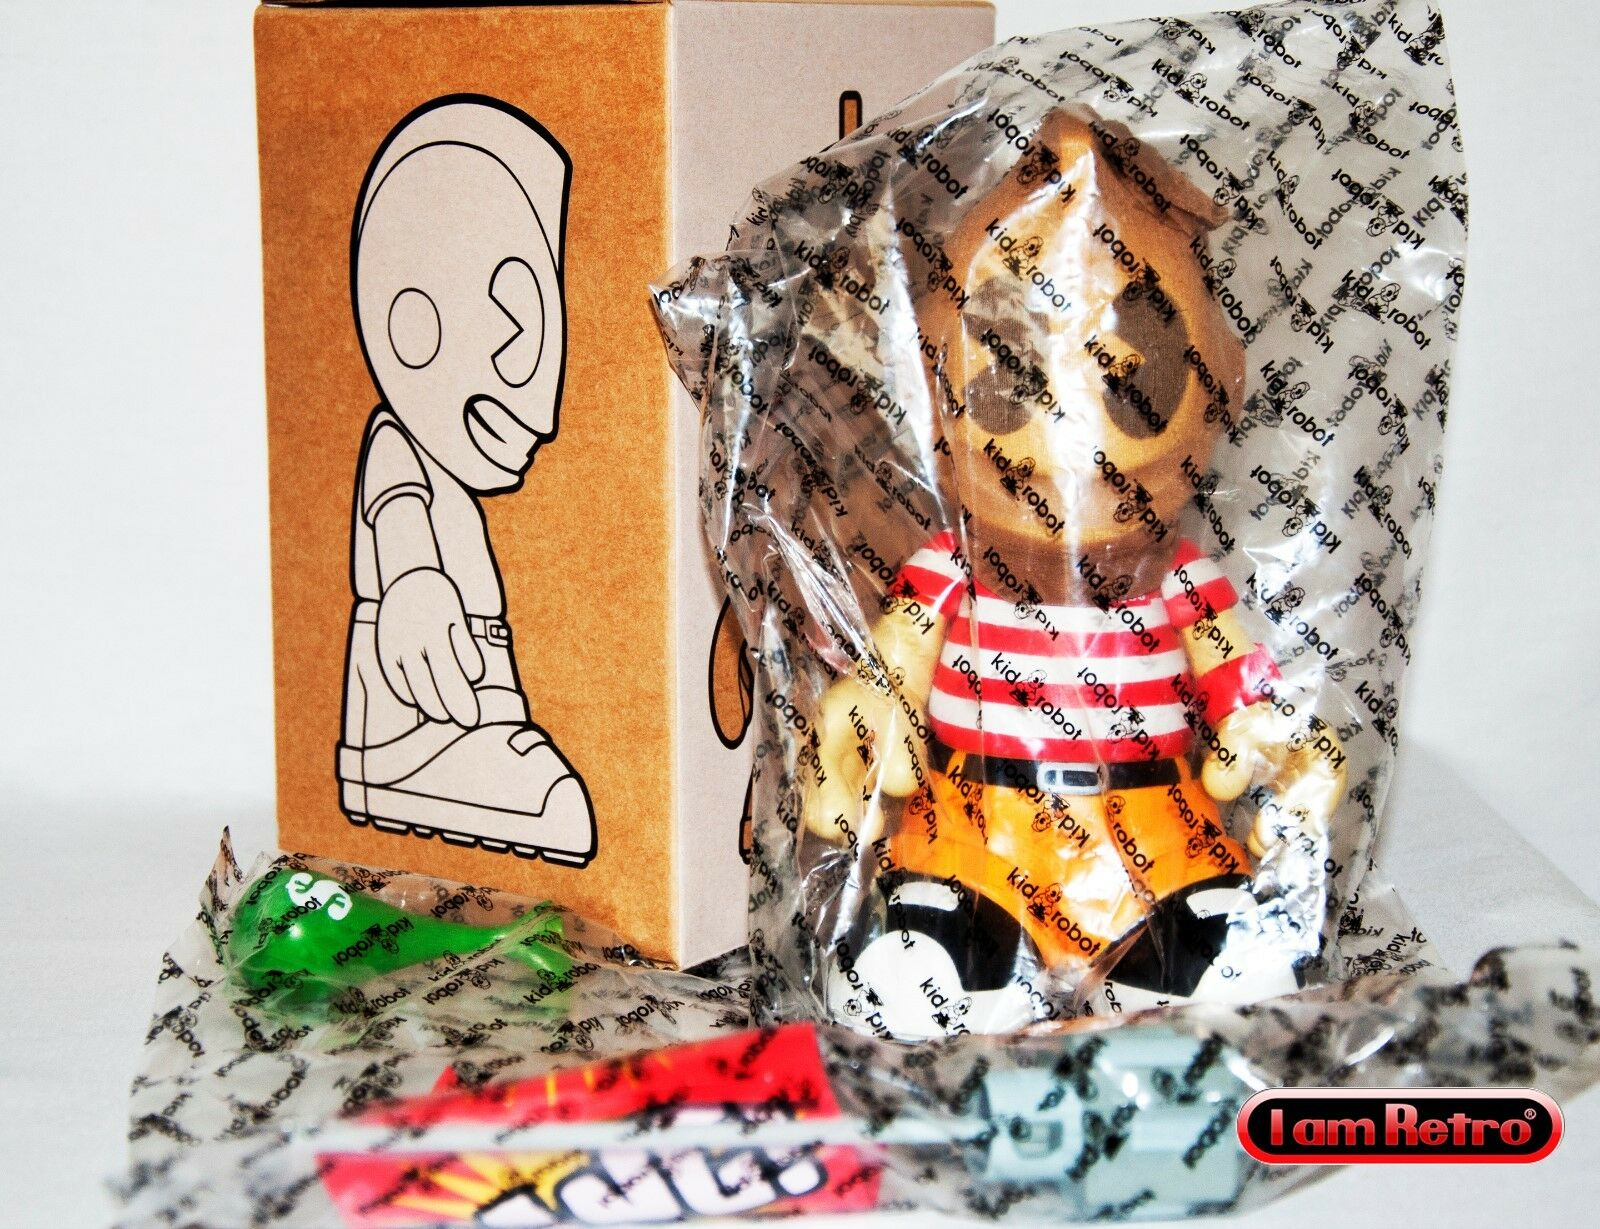 ganancia cero Kidrobber Kidrobber Kidrobber mascota de Tristan Eaton x Kidrobot 100 piezas hechas Extremadamente Raro  Ahorre 60% de descuento y envío rápido a todo el mundo.